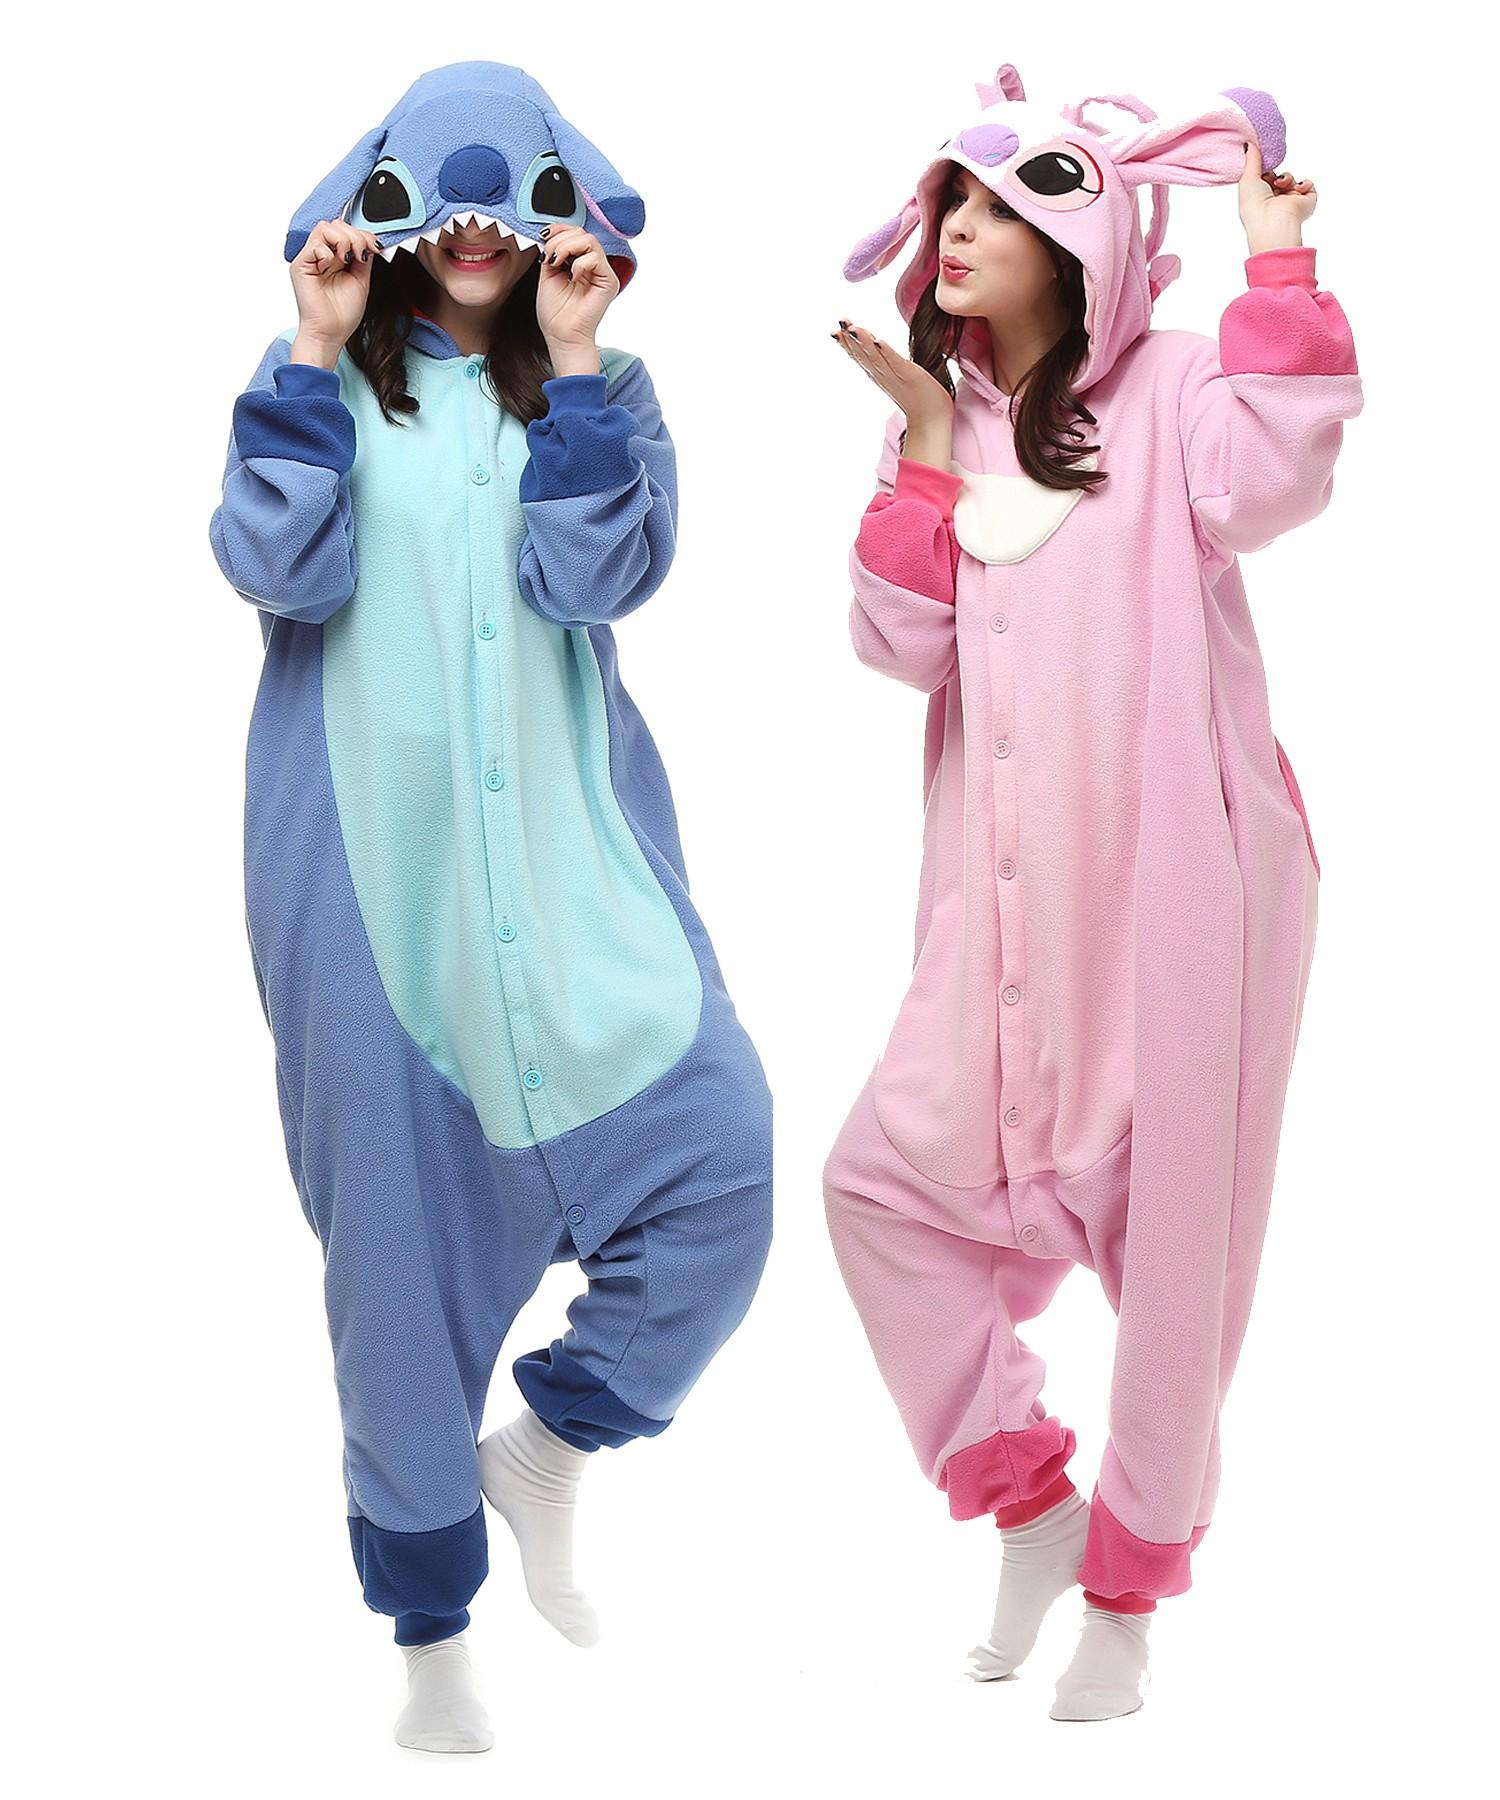 6869081bfacf Stitch And Angel Kigurumi Onesie Pajamas Animal Costumes For Adult   Teens